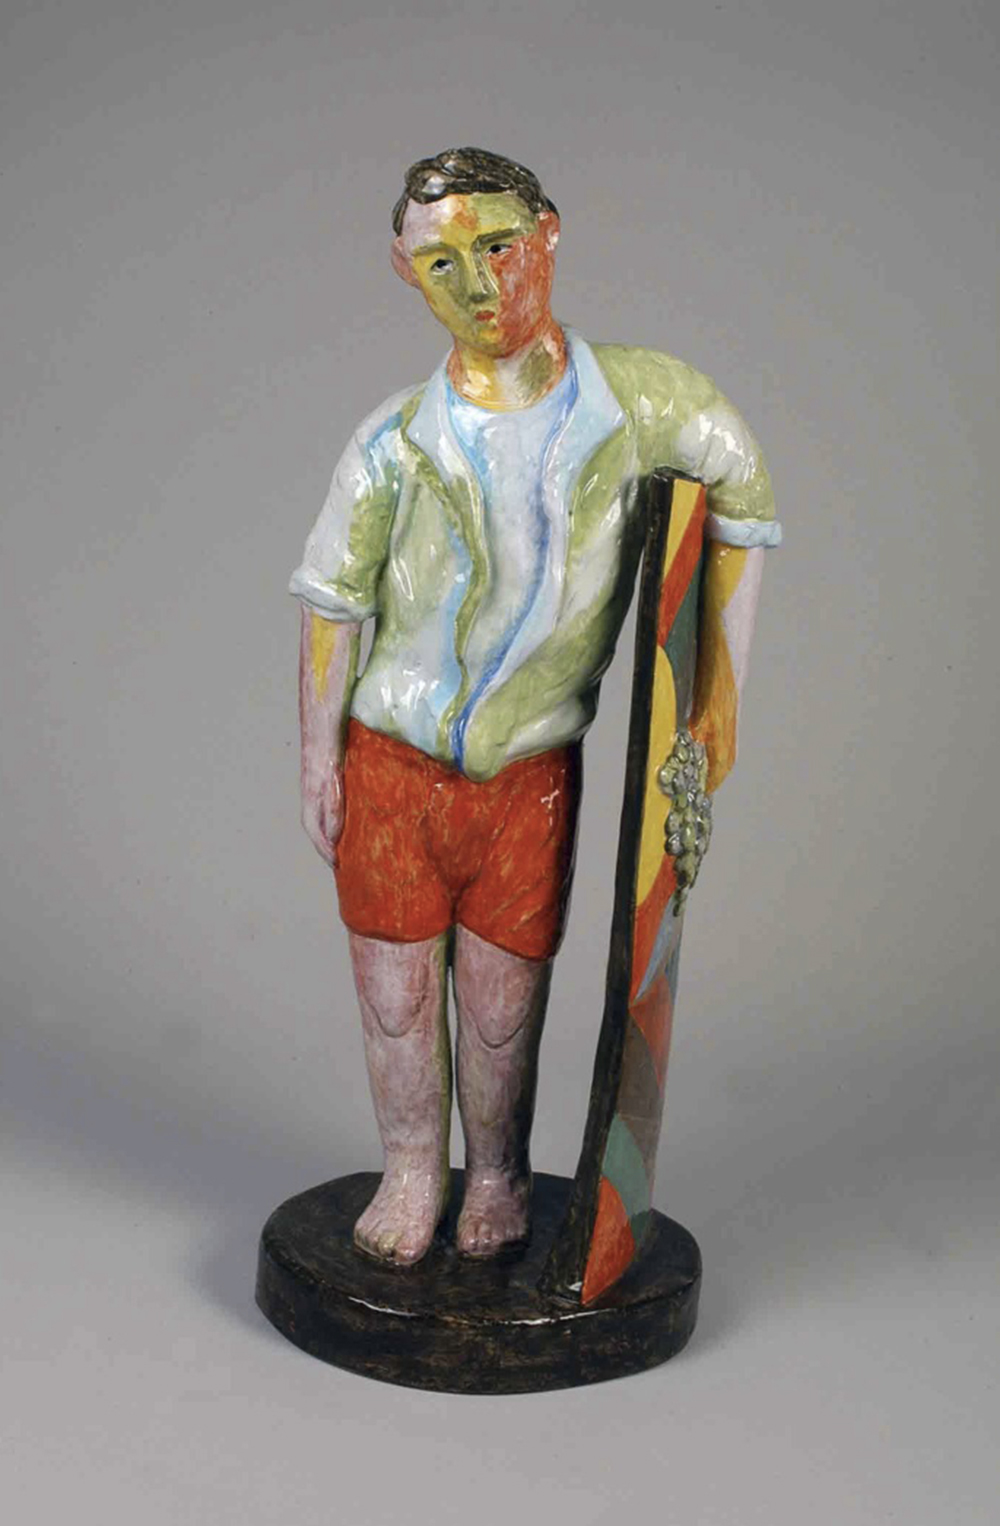 Sandro Chia, Riposo, 2005, ceramica policroma, cm 26x22x66 h